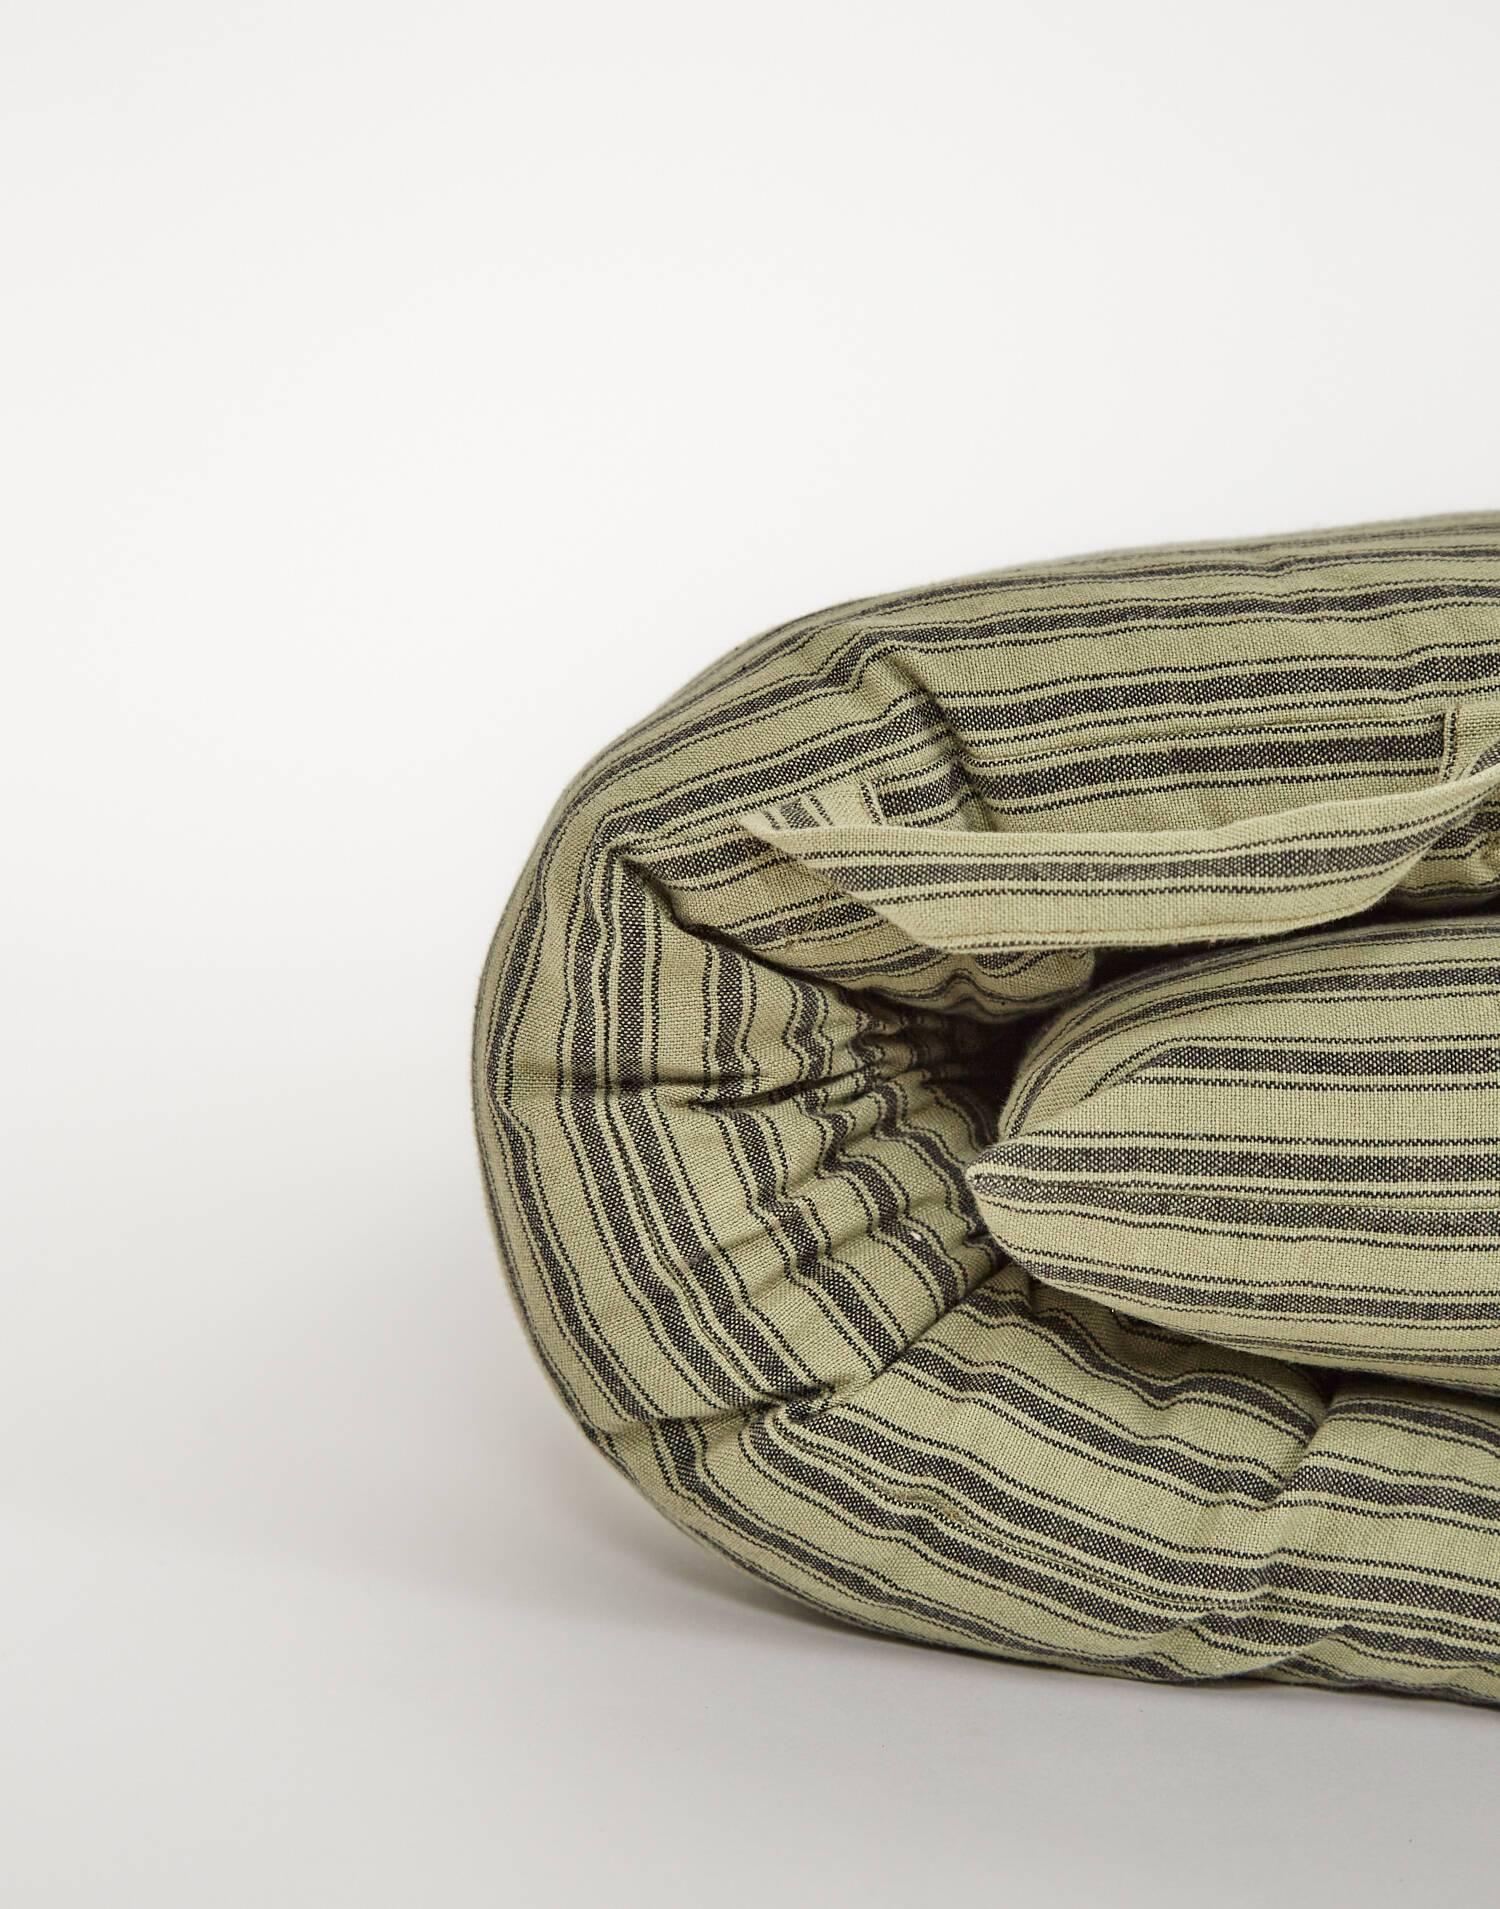 Striped cotton mattress 70*180